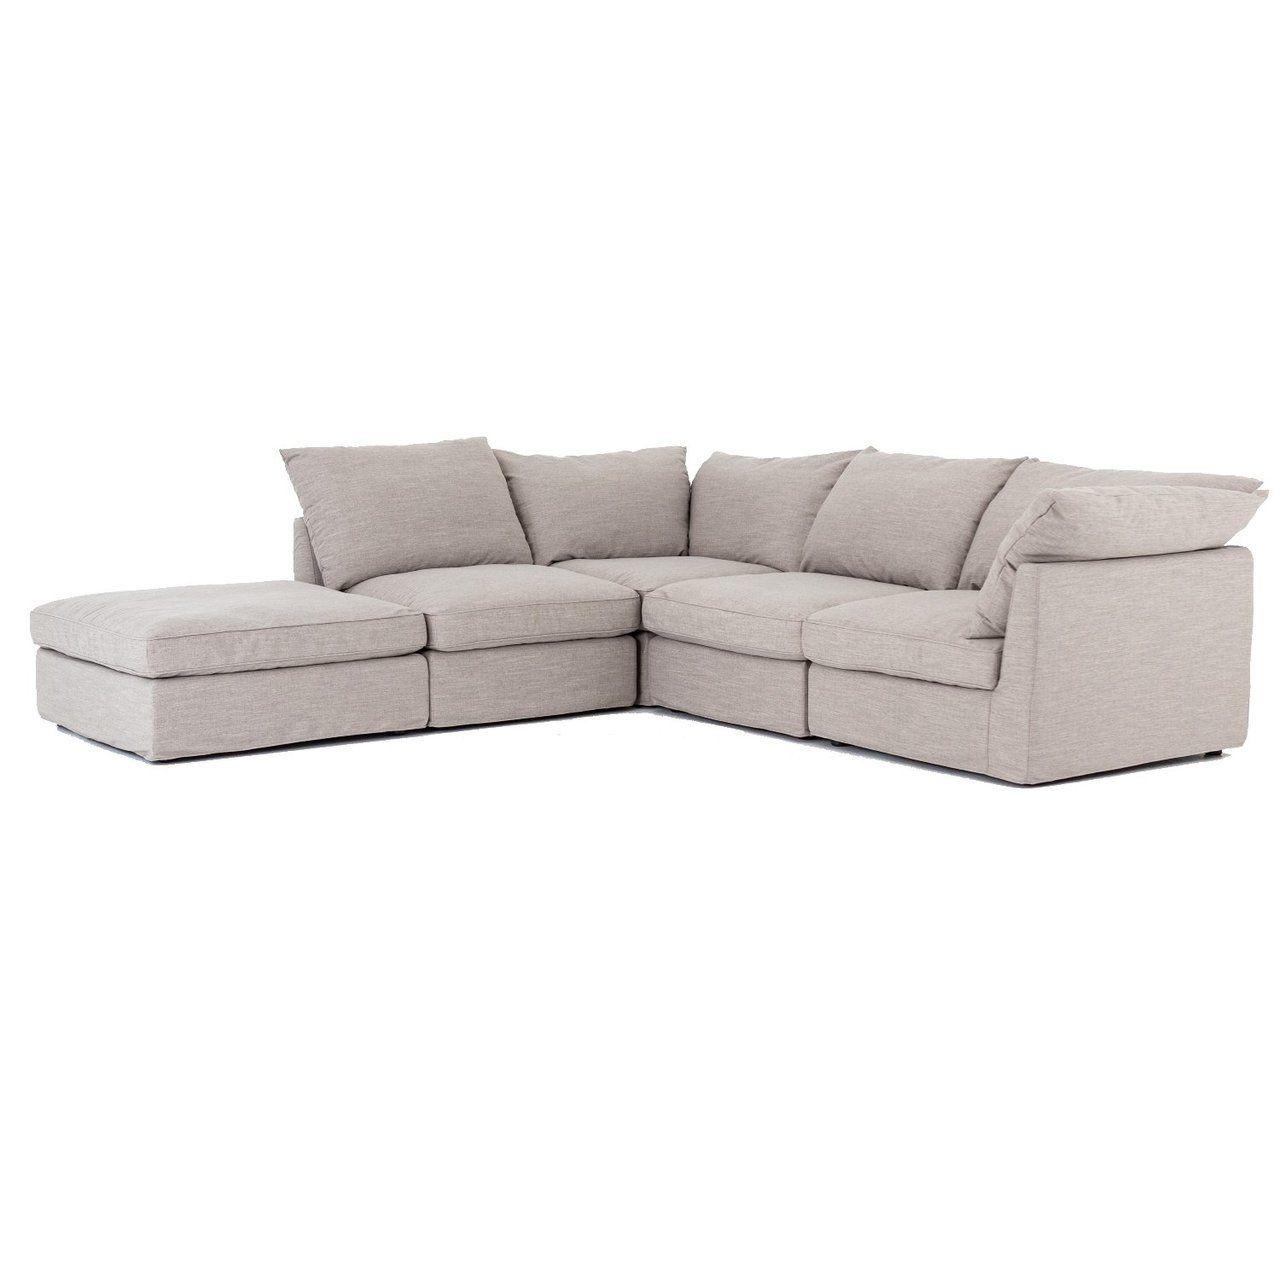 Best Paul Coastal Grey 5 Piece Modular Sectional Sofa Sofas 400 x 300